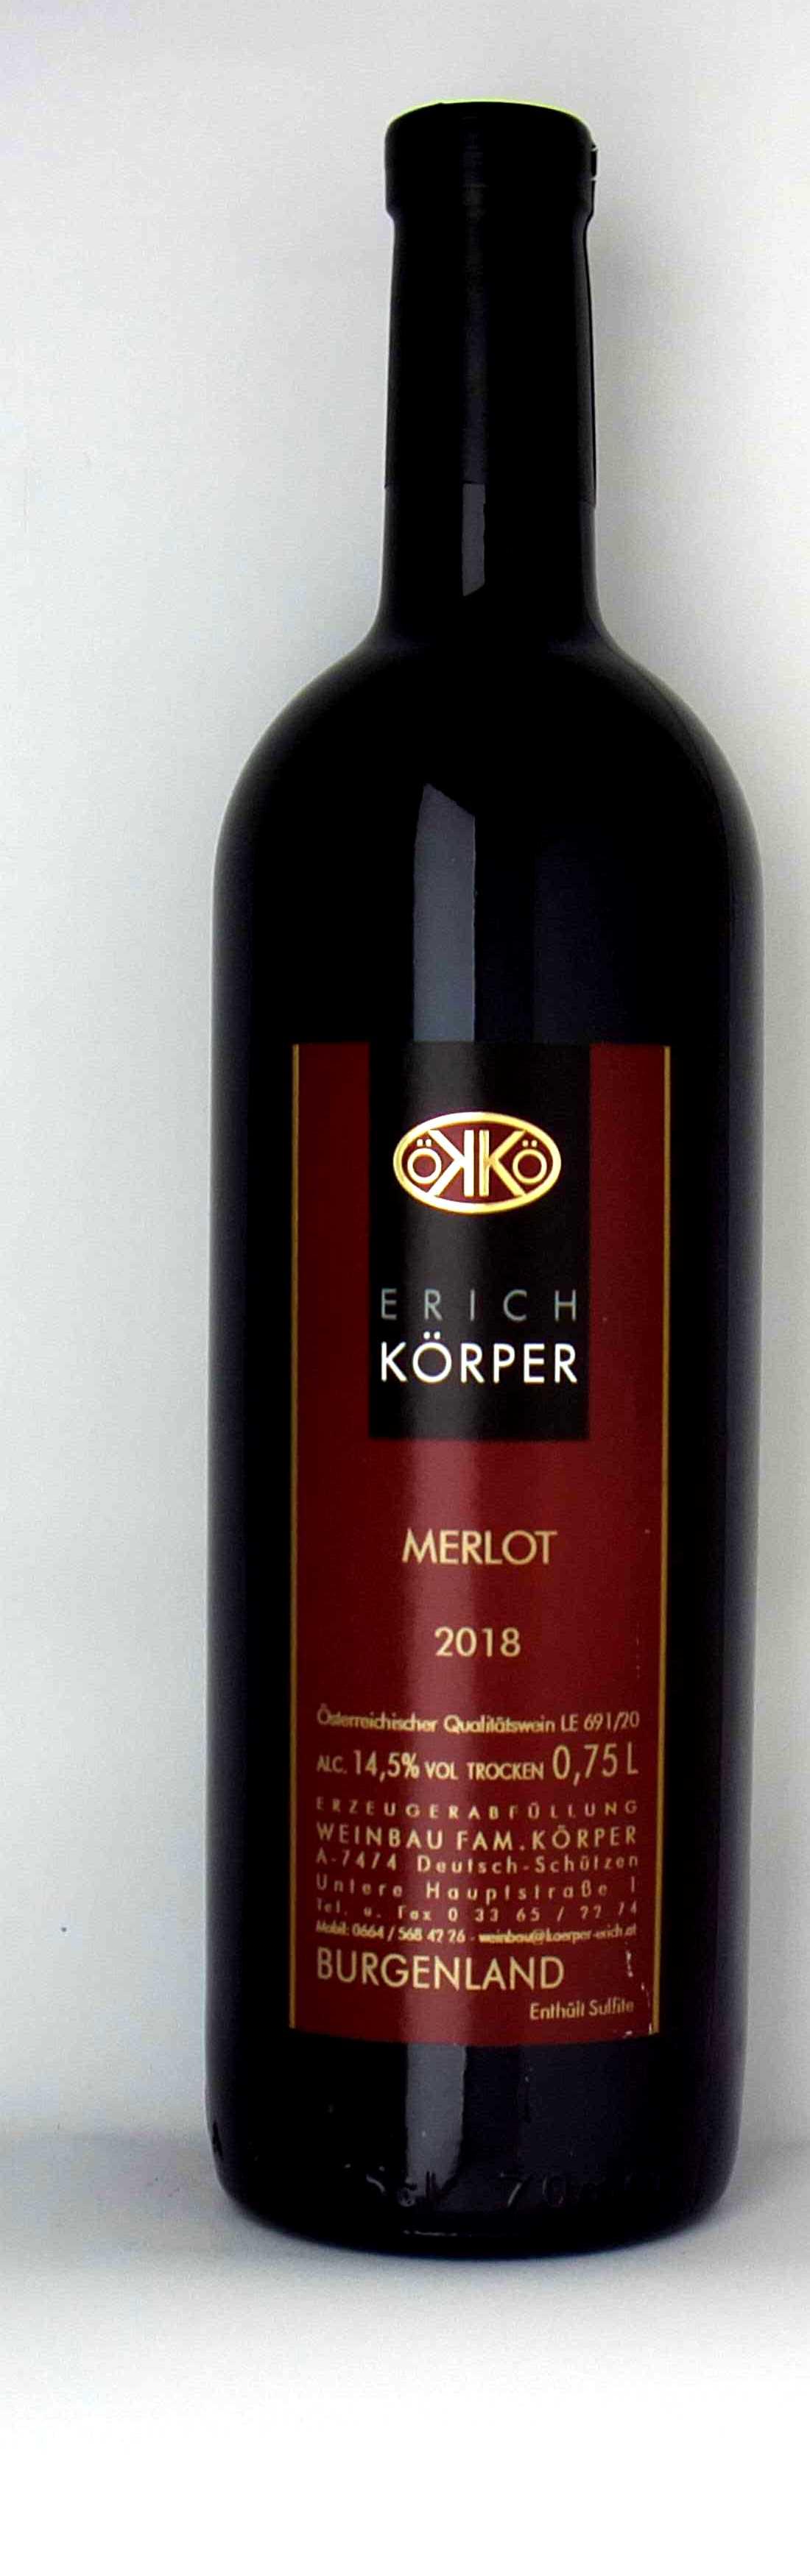 Vinothek Eisenberg Merlot 2018 Körper Erich